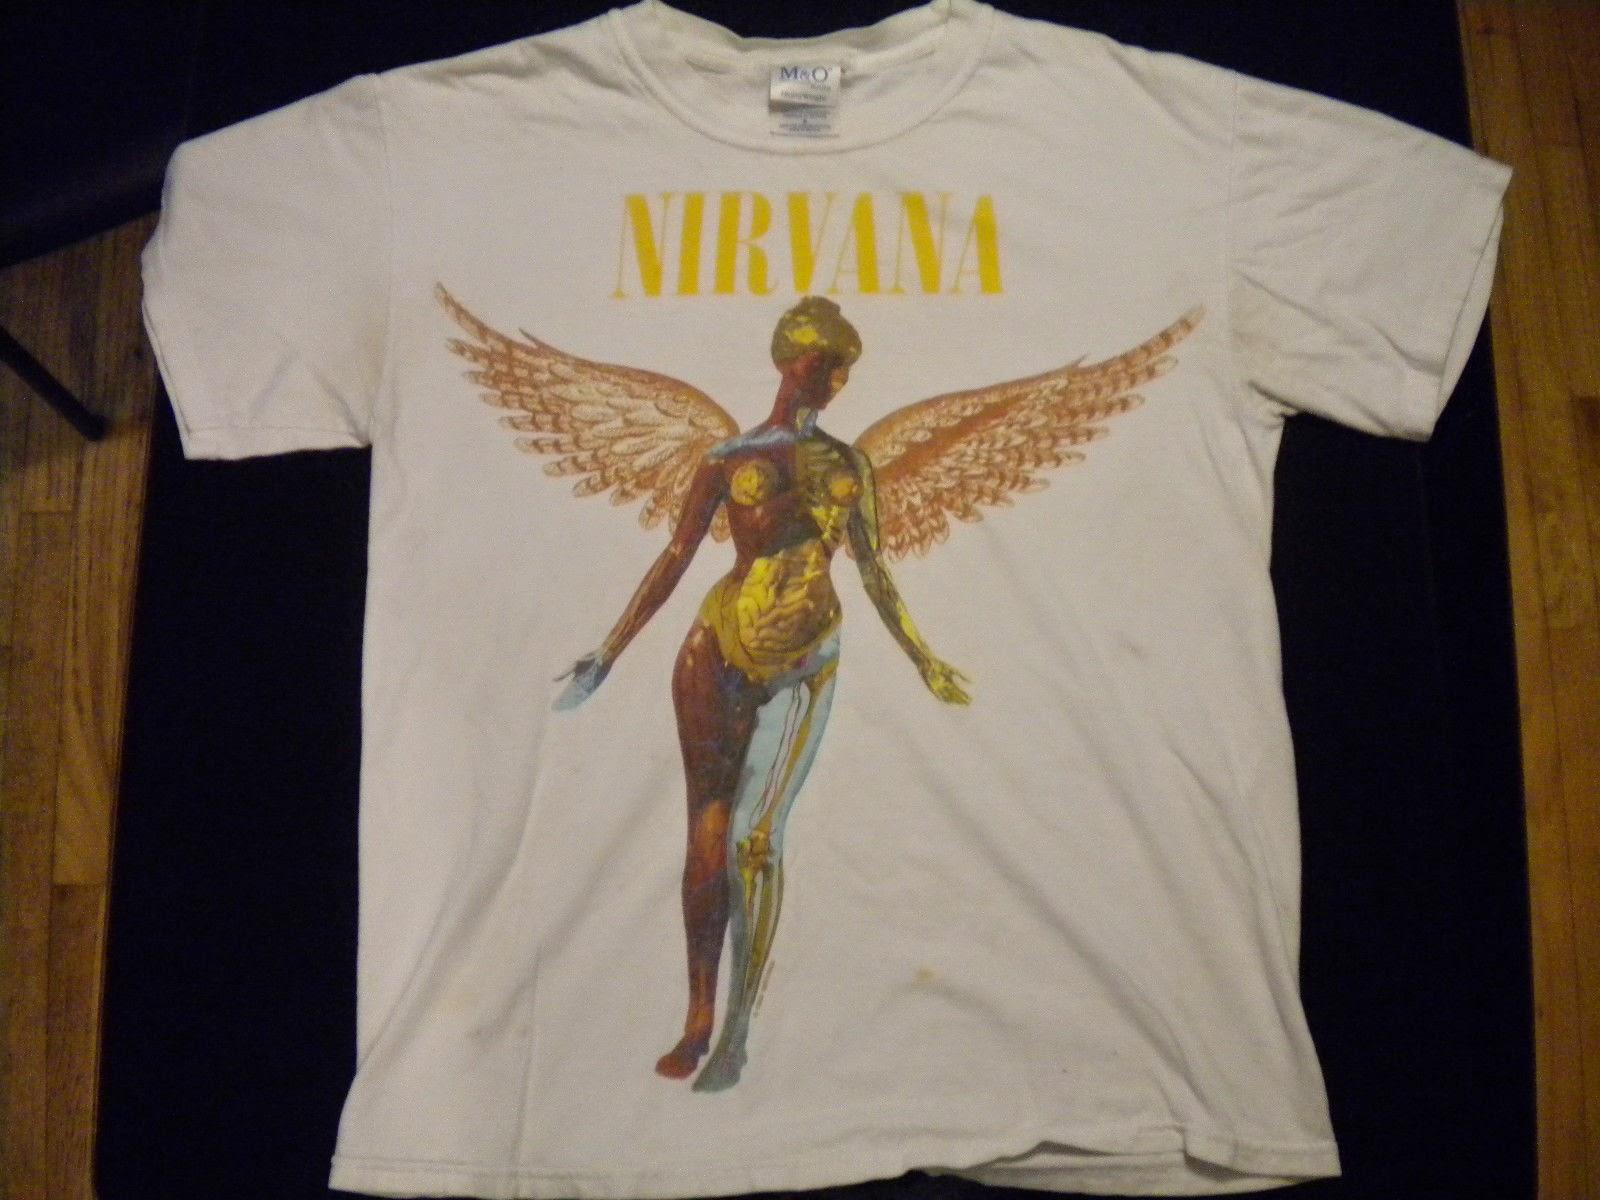 ace413fe NIRVANA IN UTERO T-SHIRT licensed 1993 M&O rare 90's | vintage t-shirt